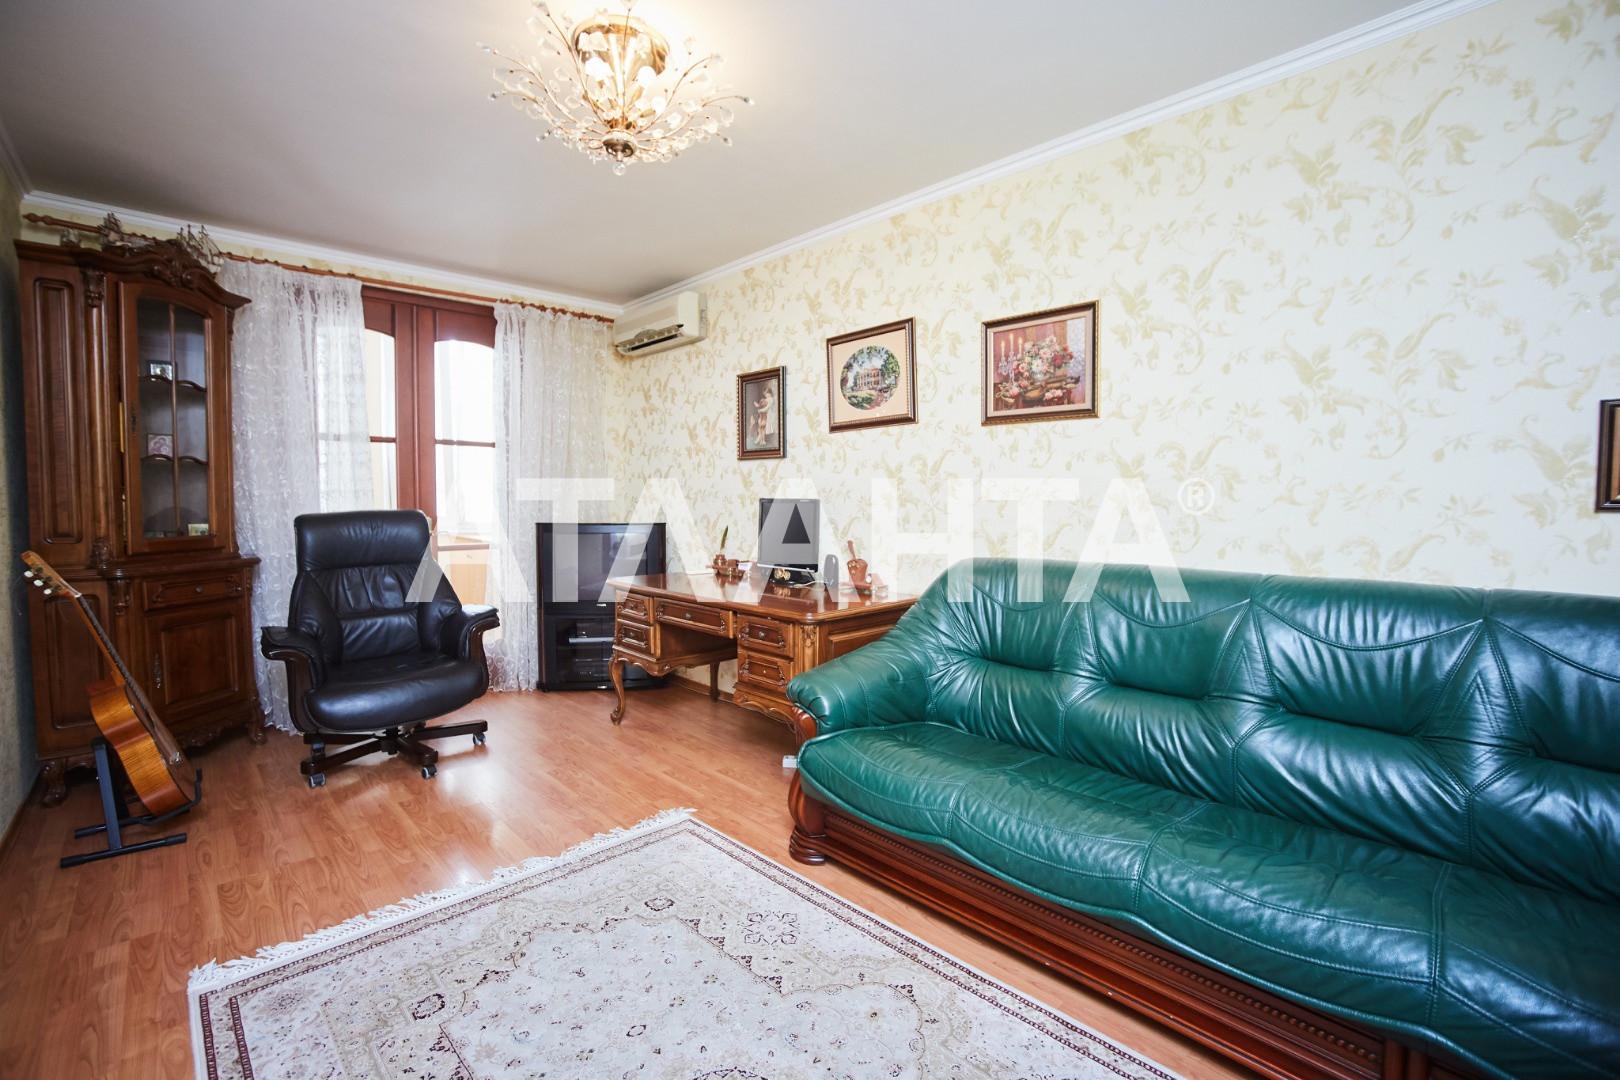 Продается Многоуровневая Квартира на ул. Посмитного — 295 000 у.е. (фото №8)